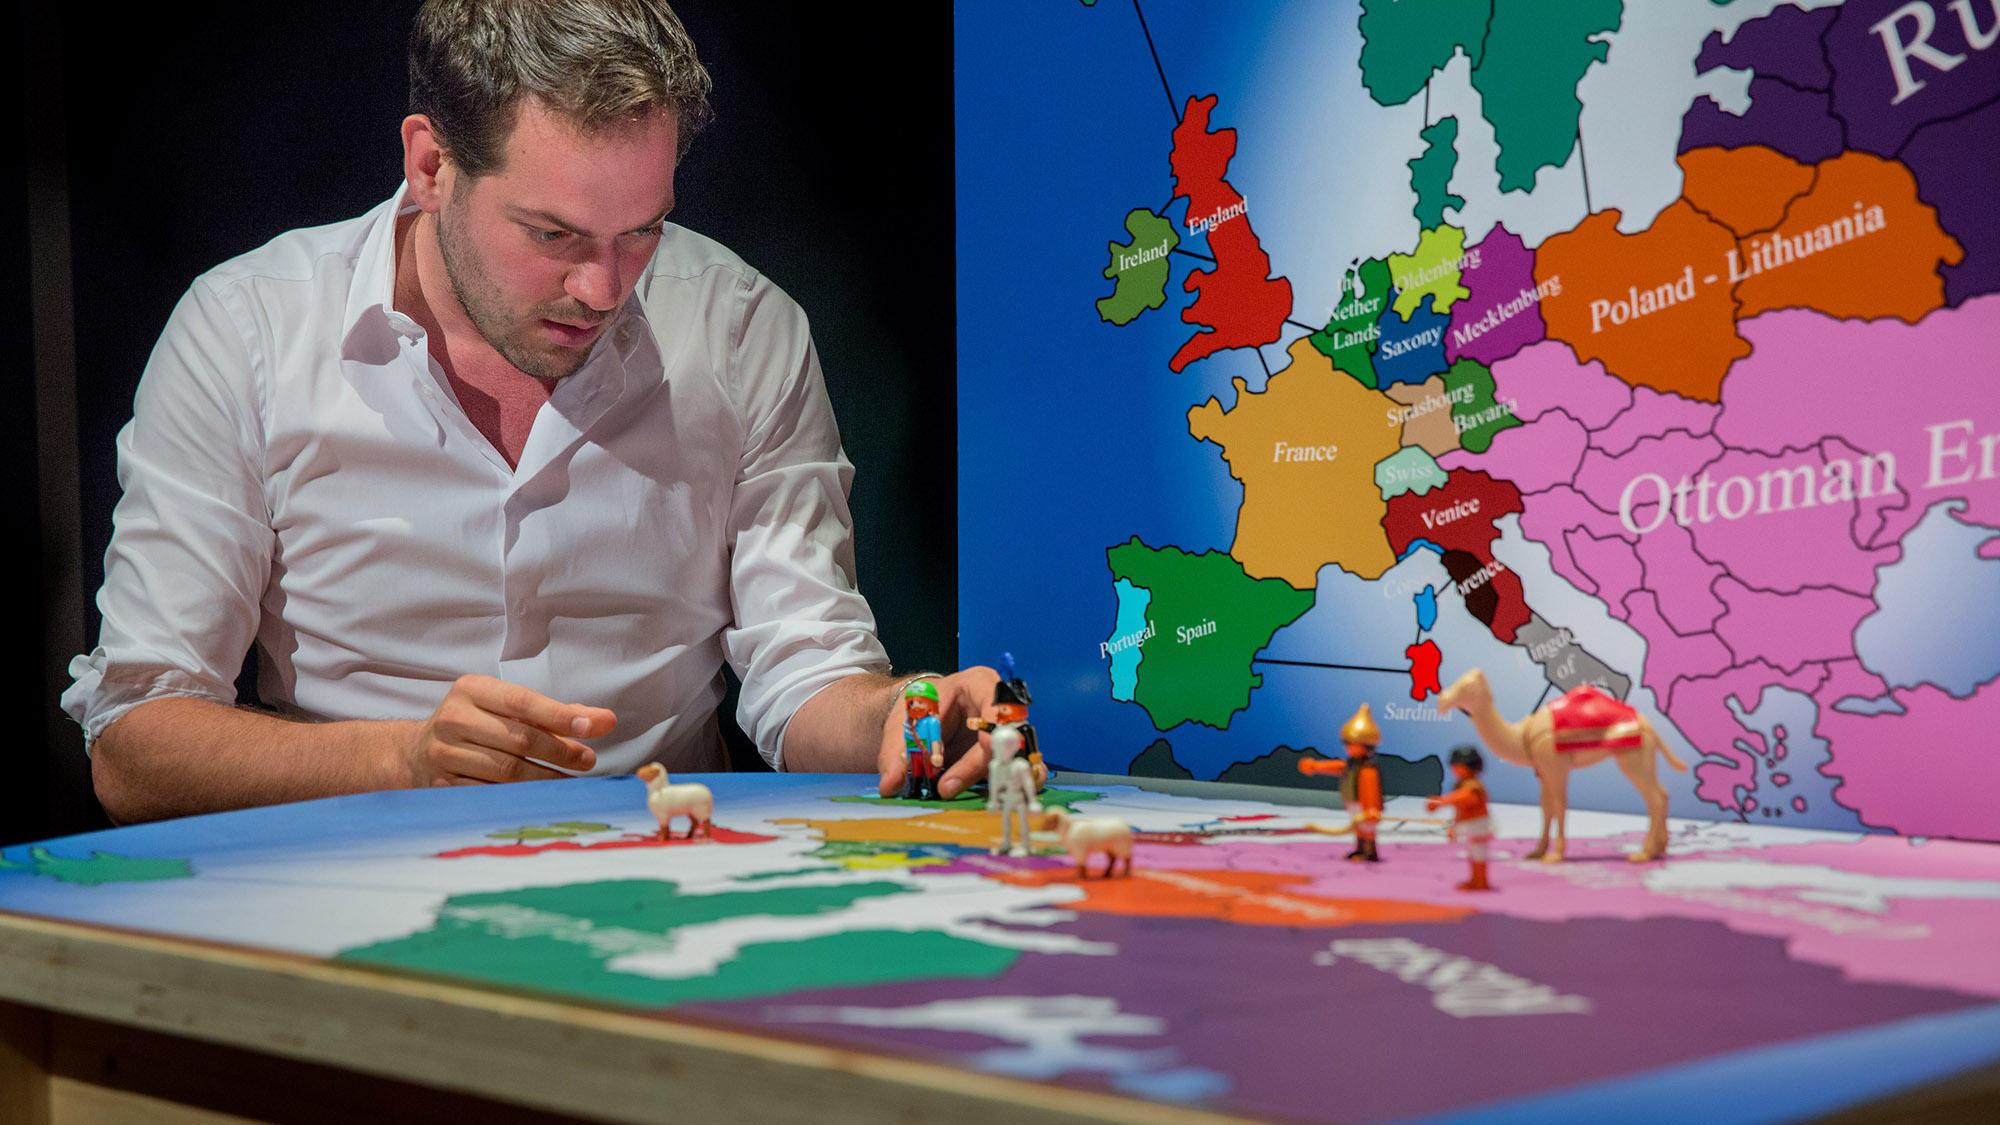 Lucas De Man - In Search of Europe © Pile Deprez